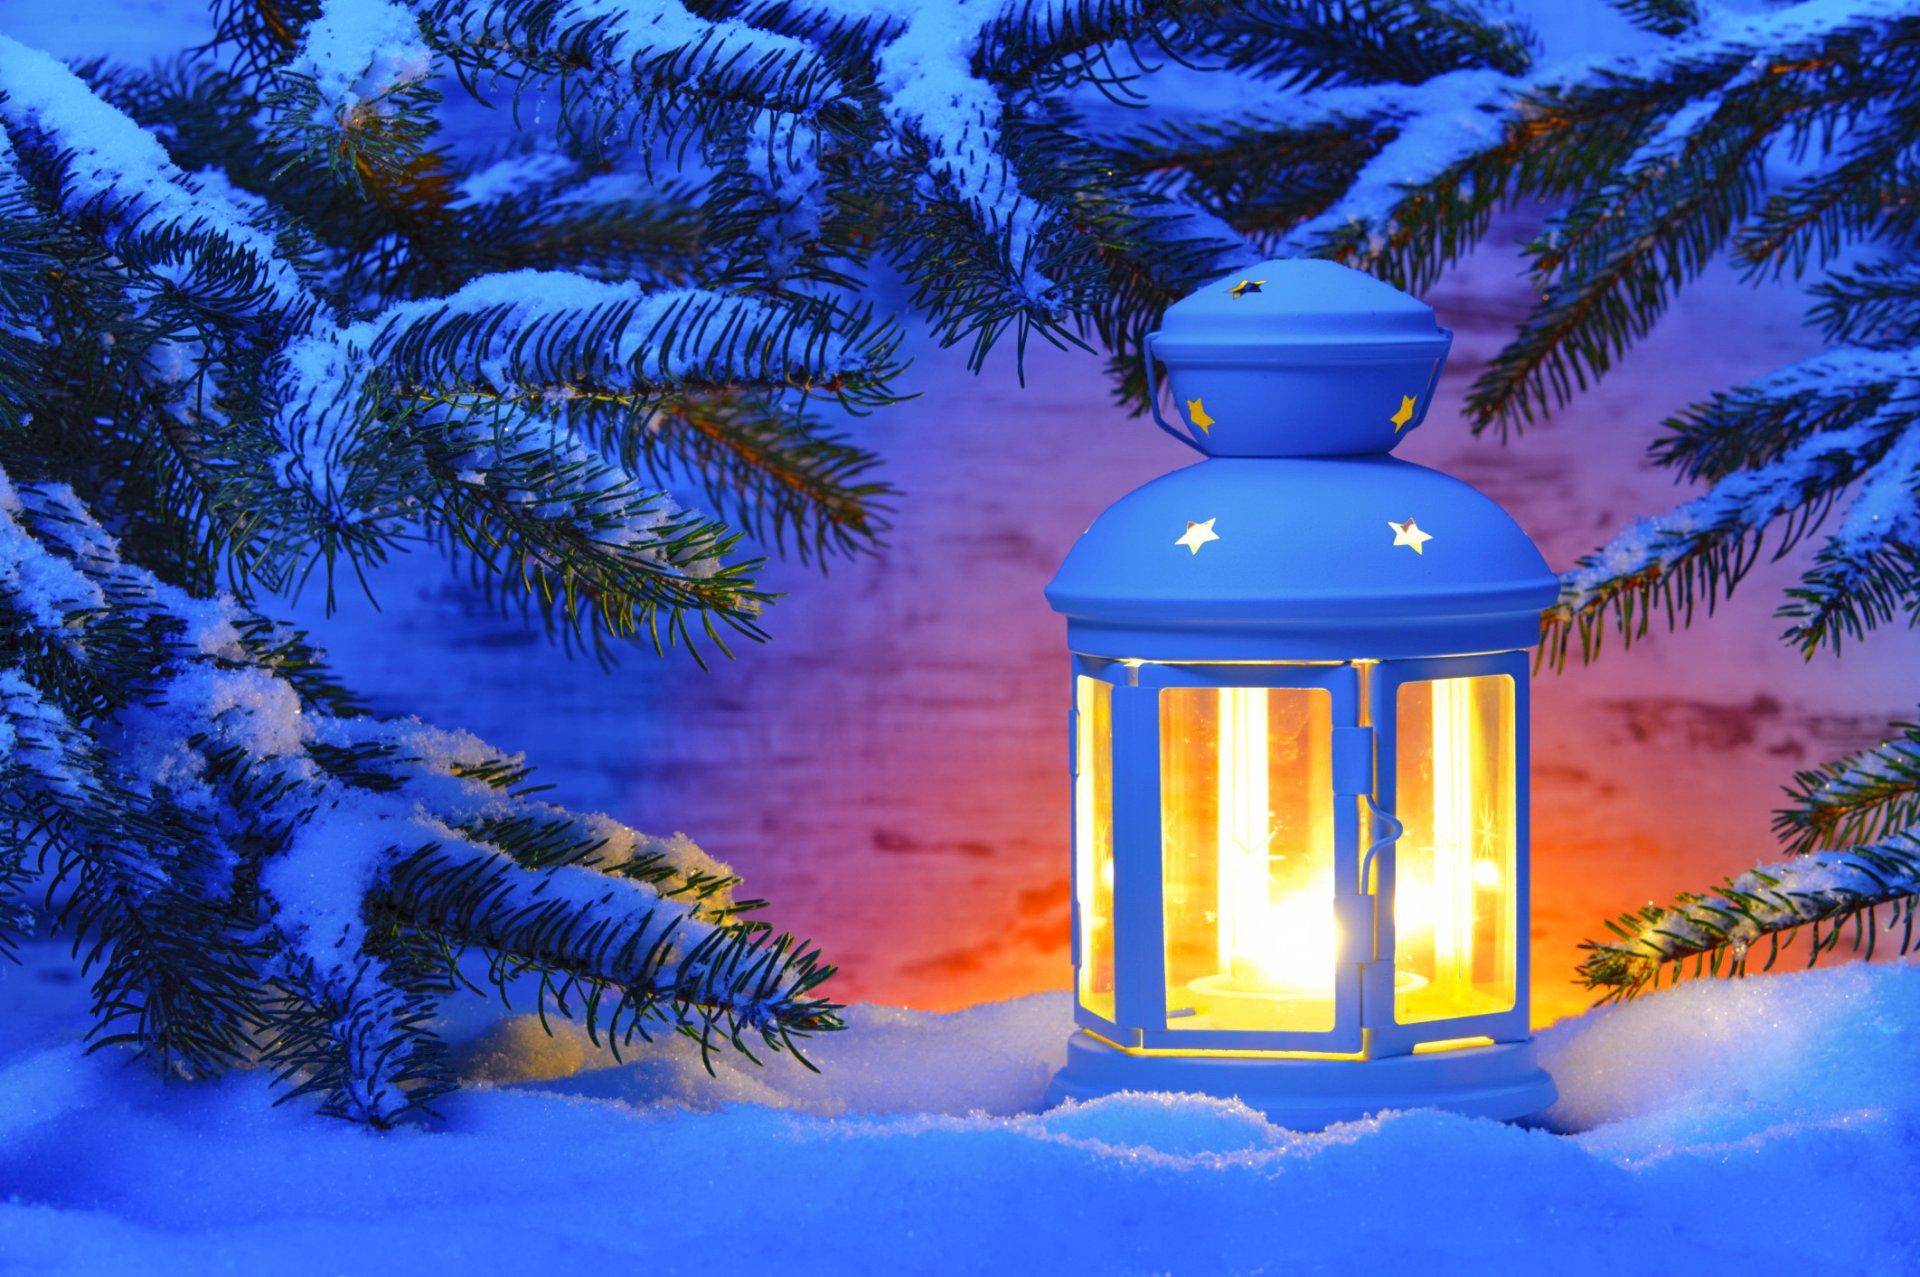 лампа свеча снег рождество lamp candle snow Christmas  № 3982749 без смс